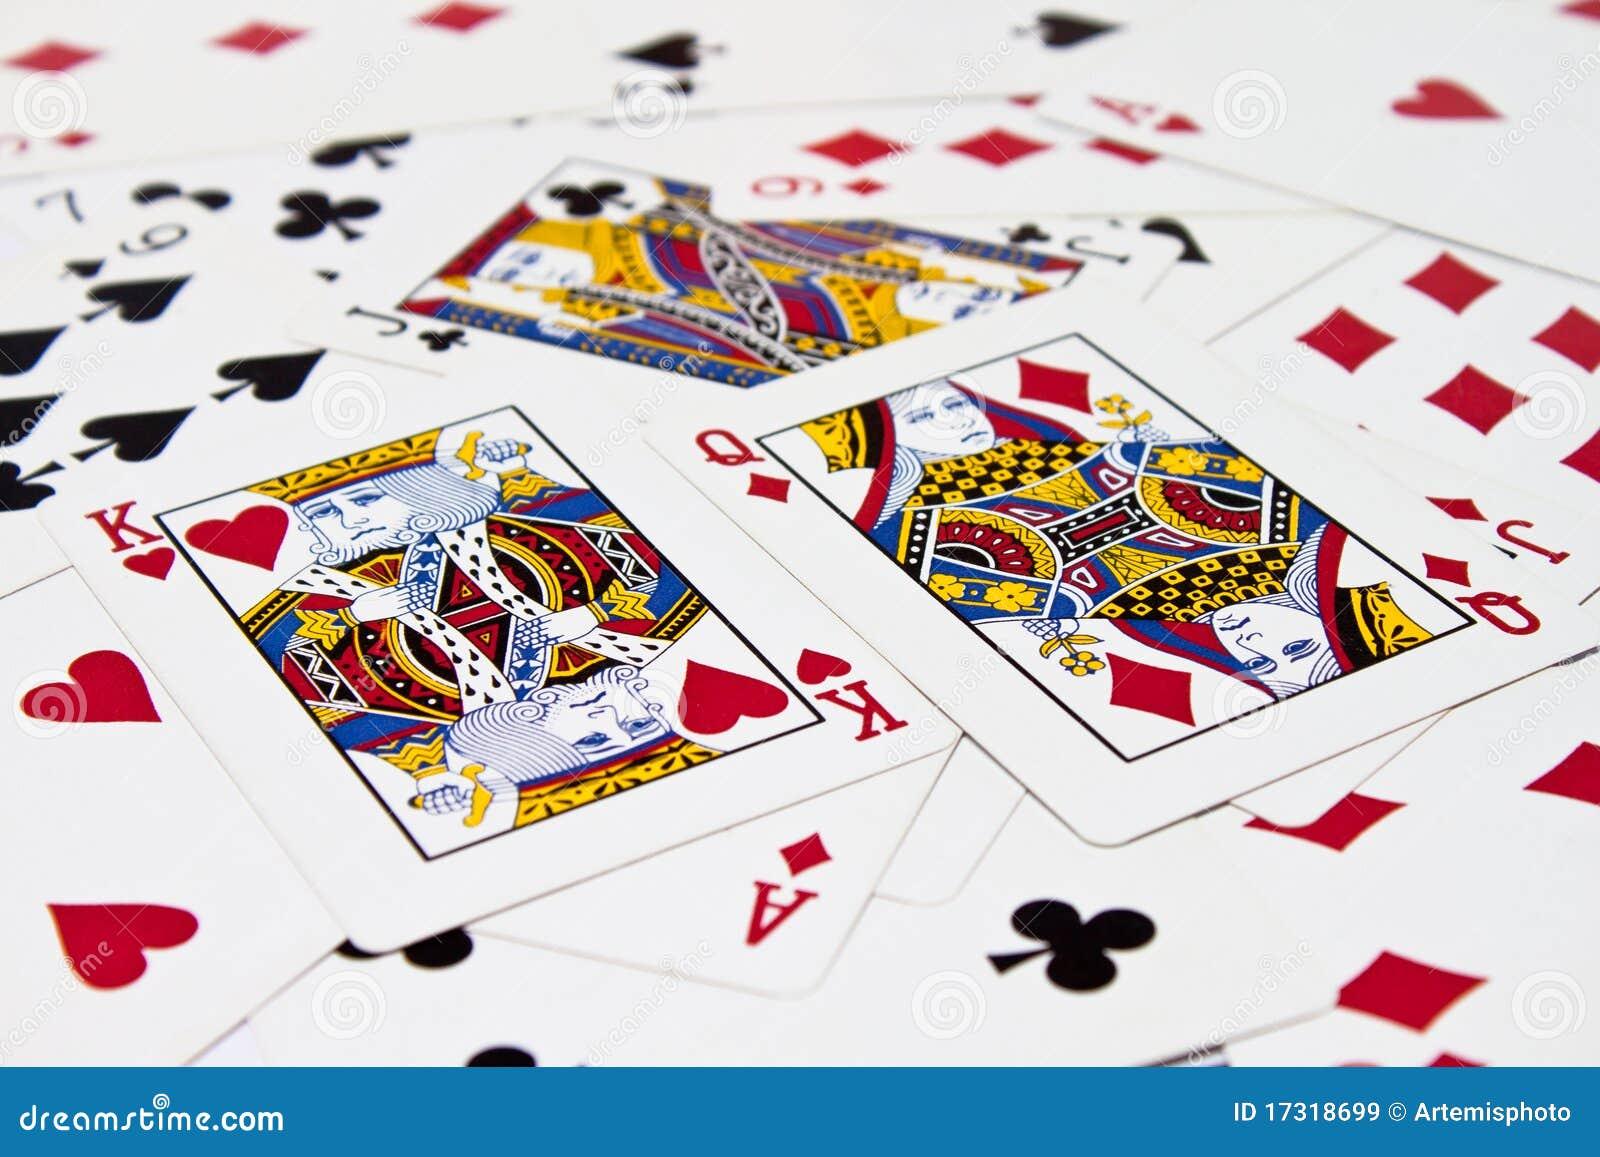 freie kartenspiele